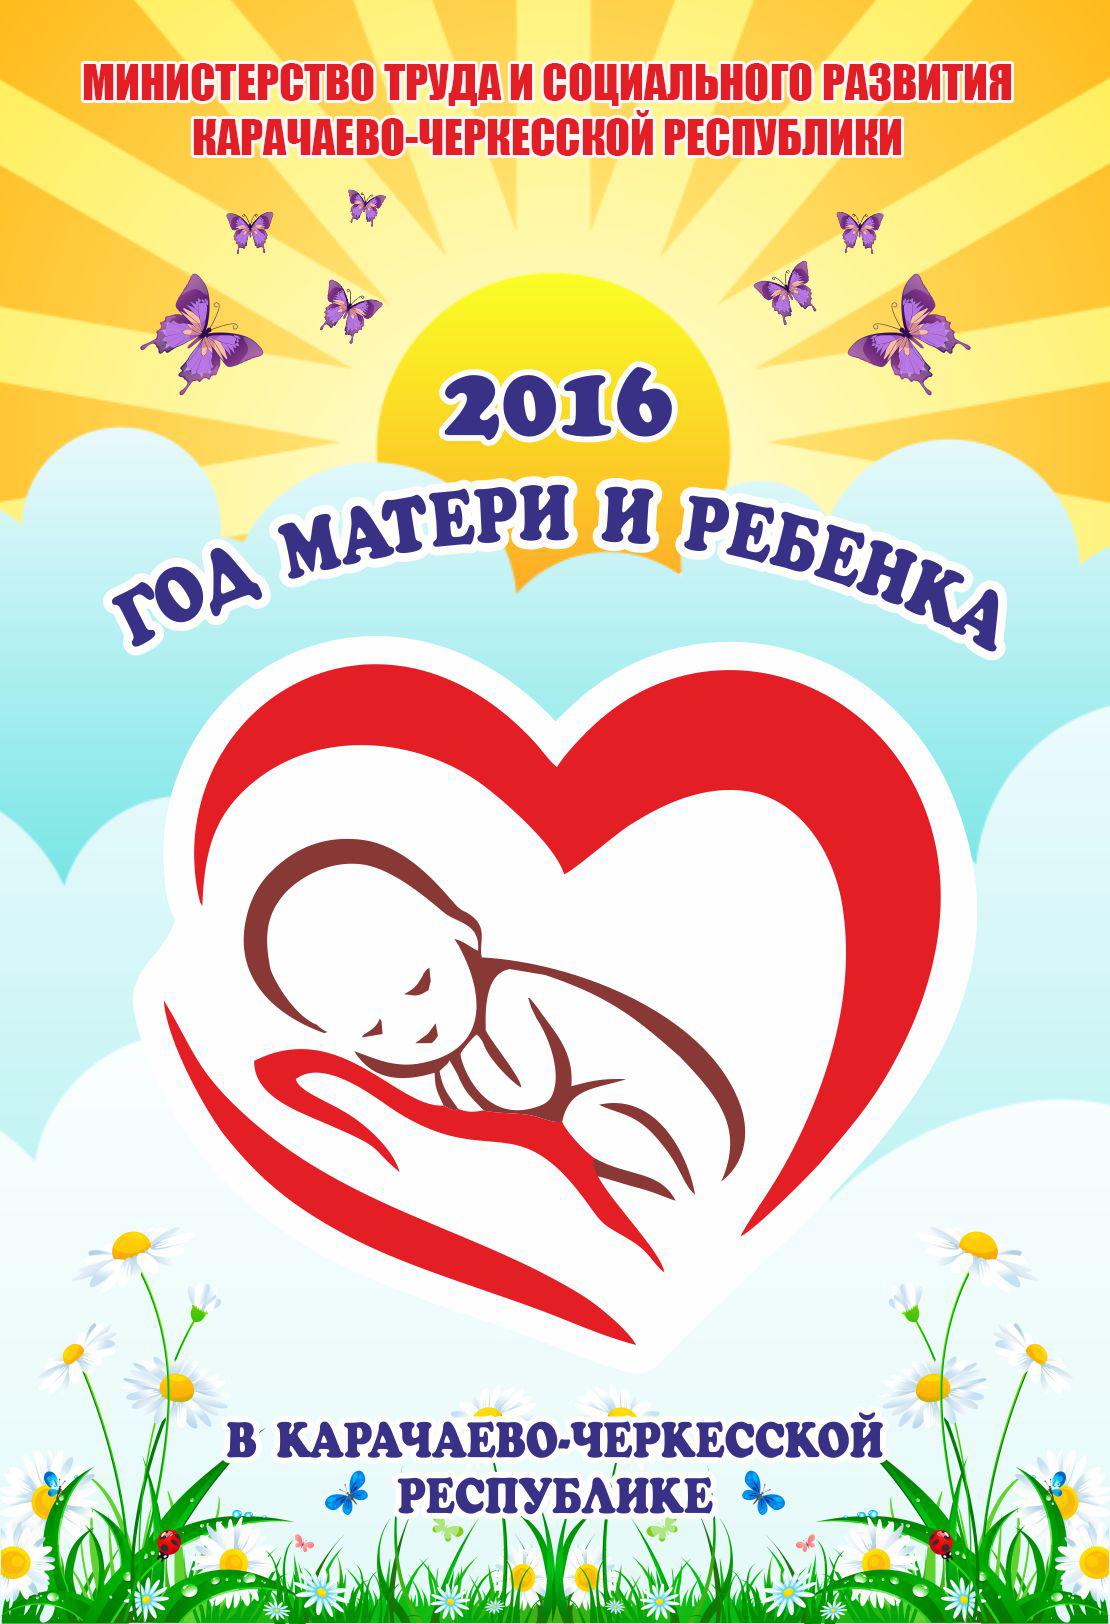 Соцзащита матери и ребенка Что